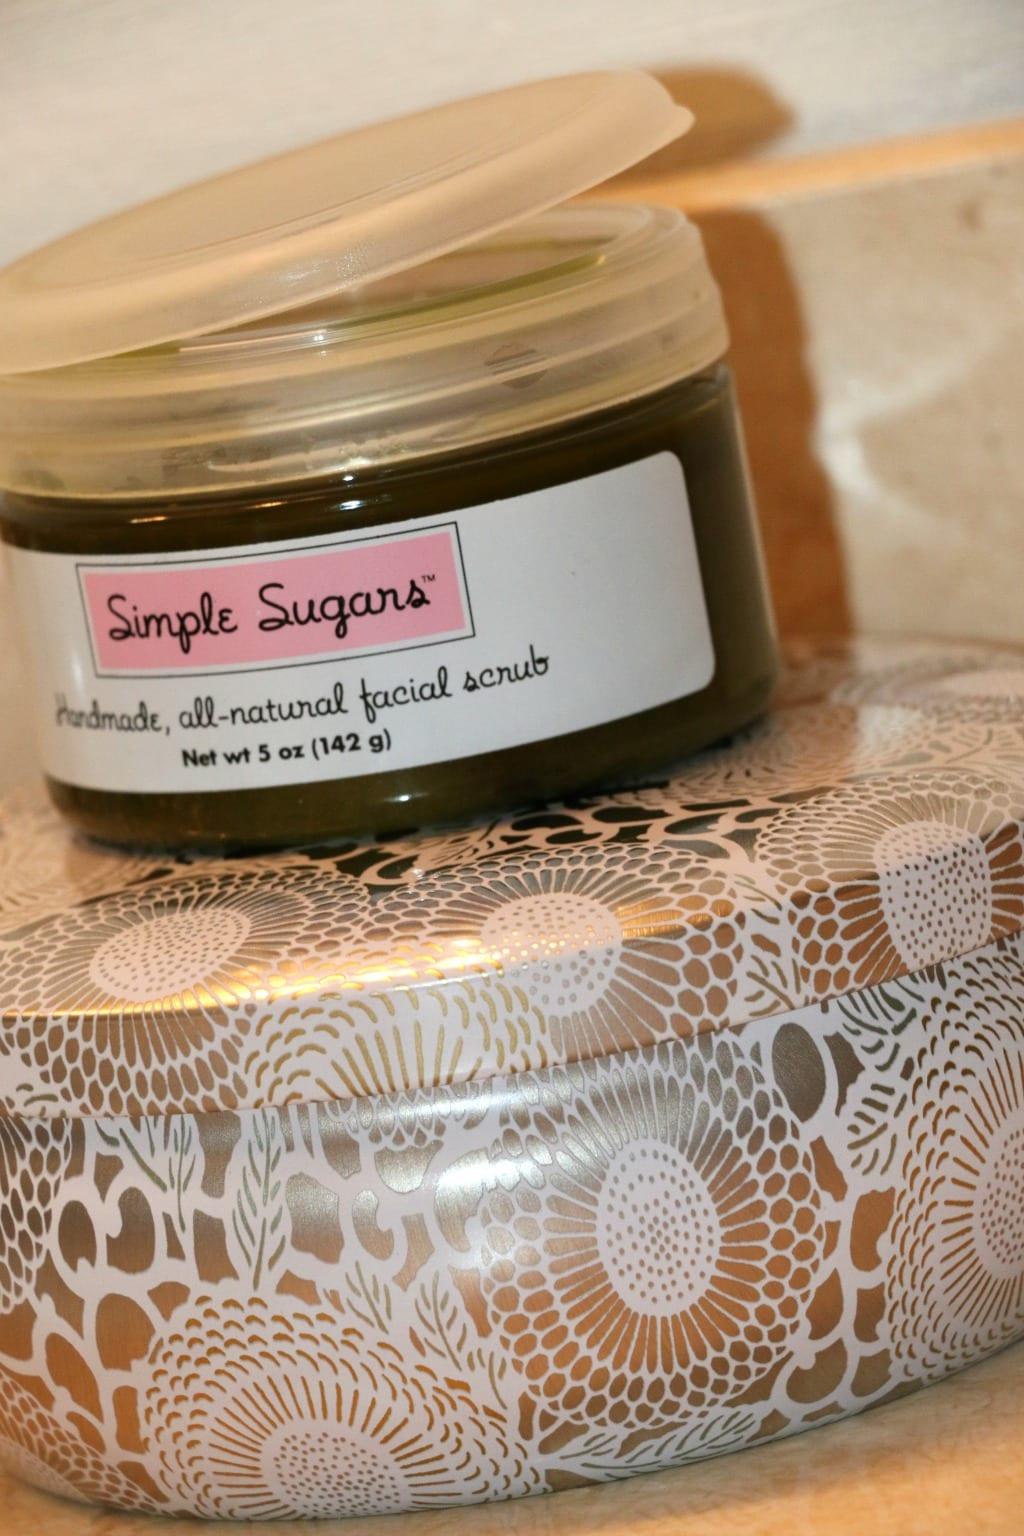 simple sugars face scrub